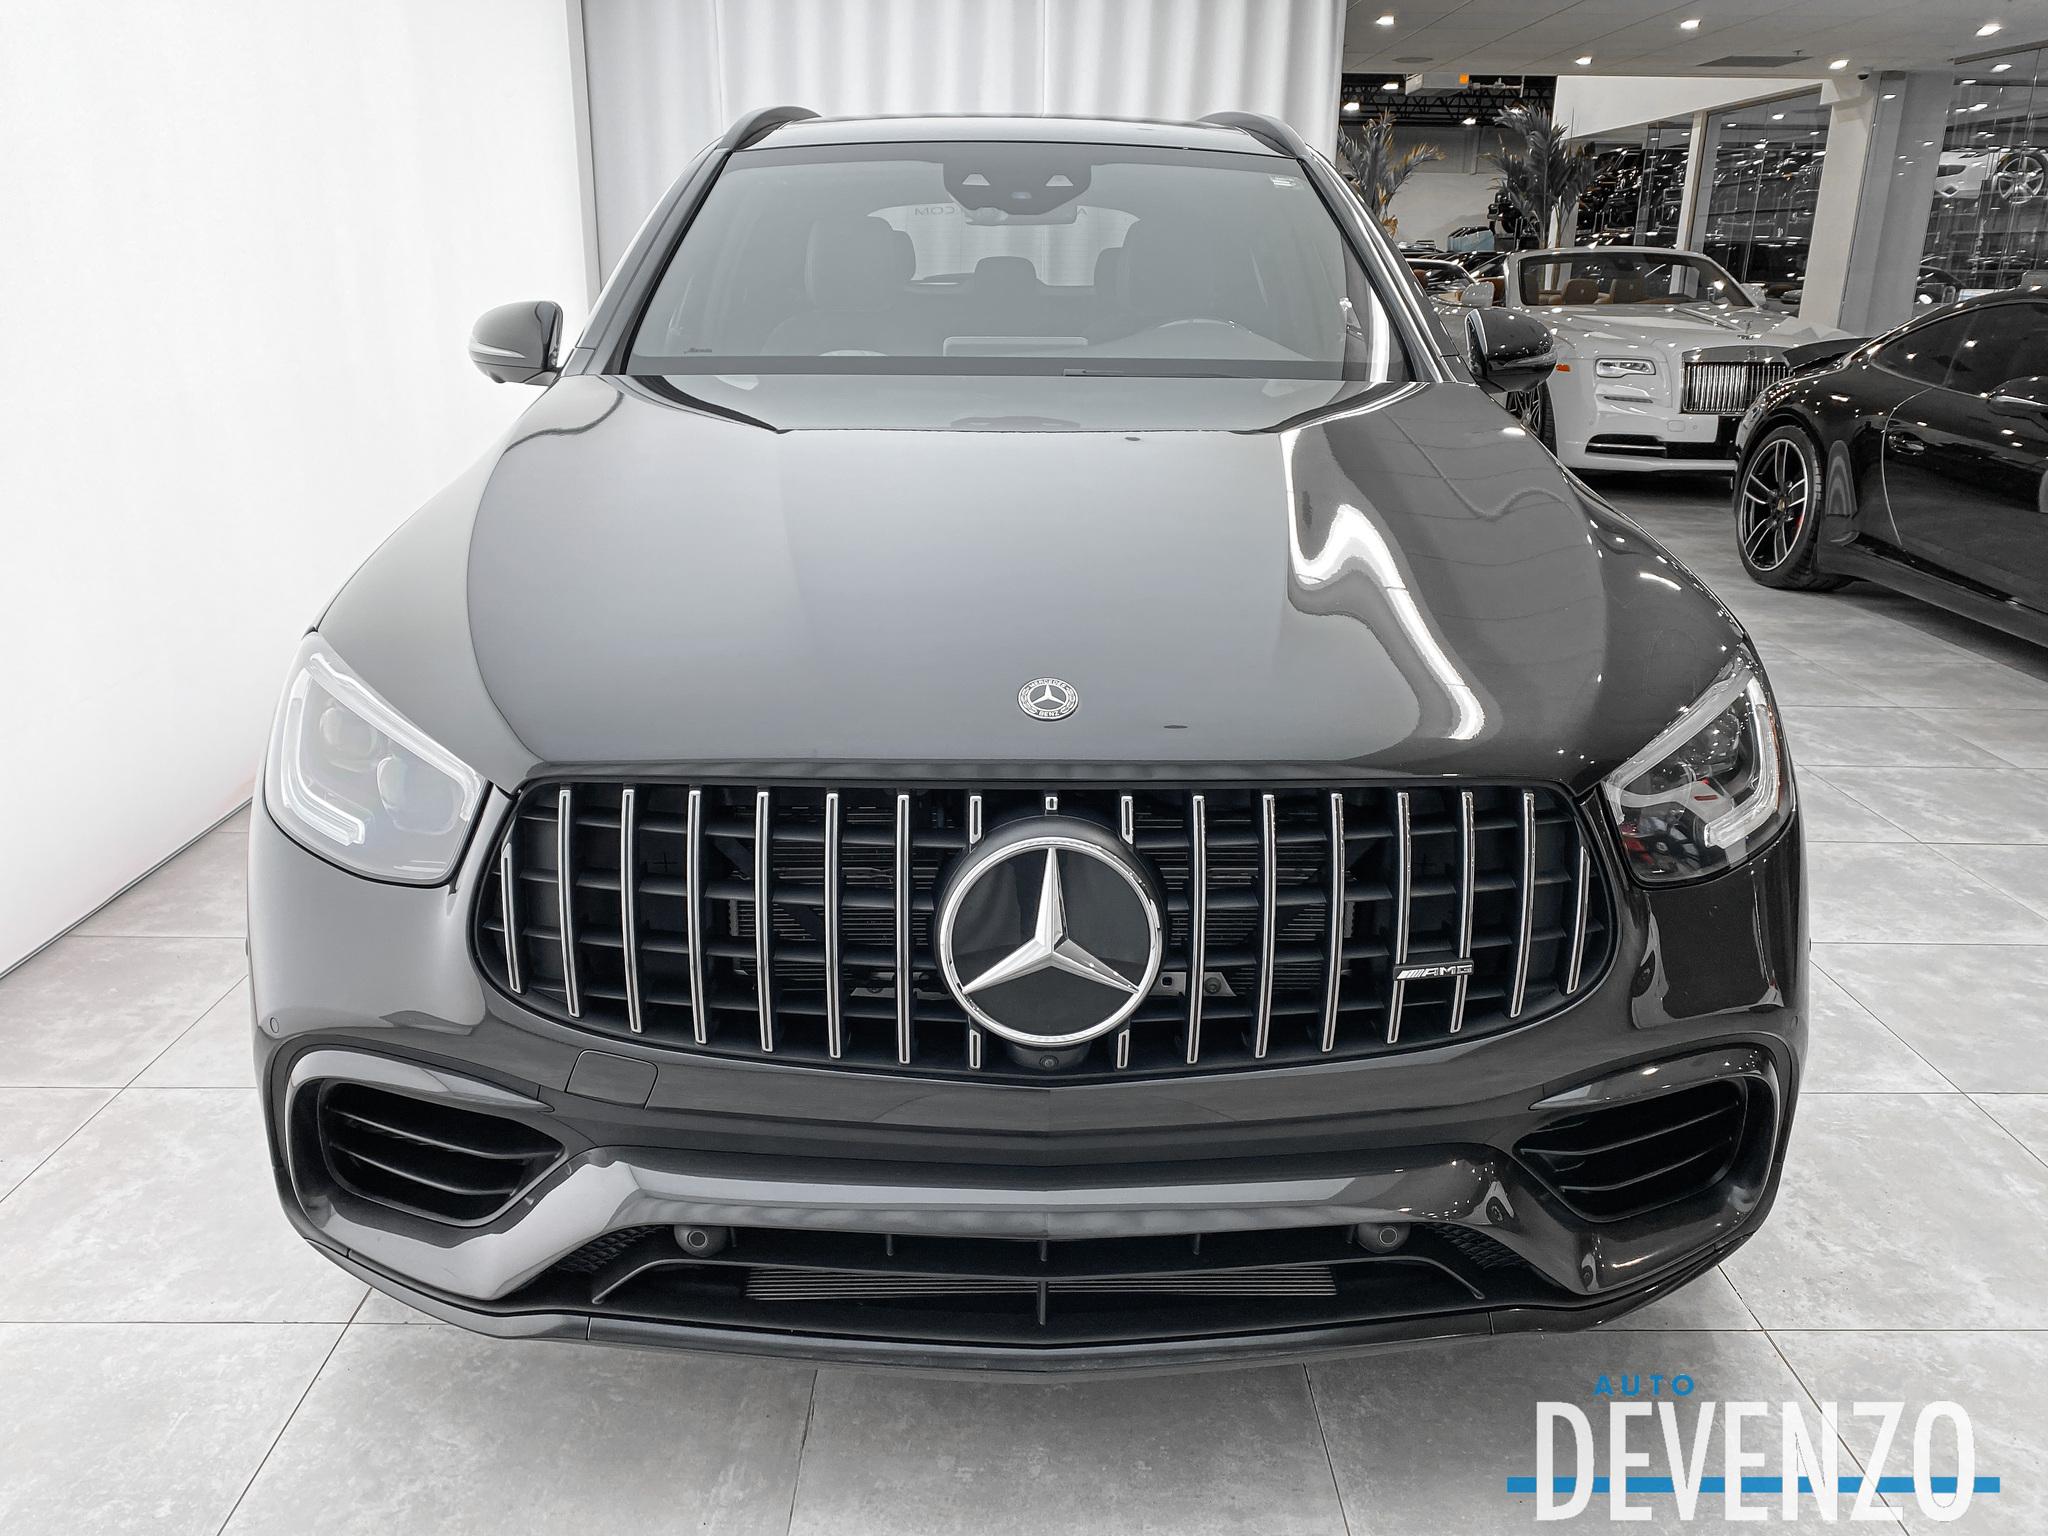 2020 Mercedes-Benz GLC AMG GLC63 S 4MATIC+ NIGHT/ DESIGNO / CARBON FIBER complet